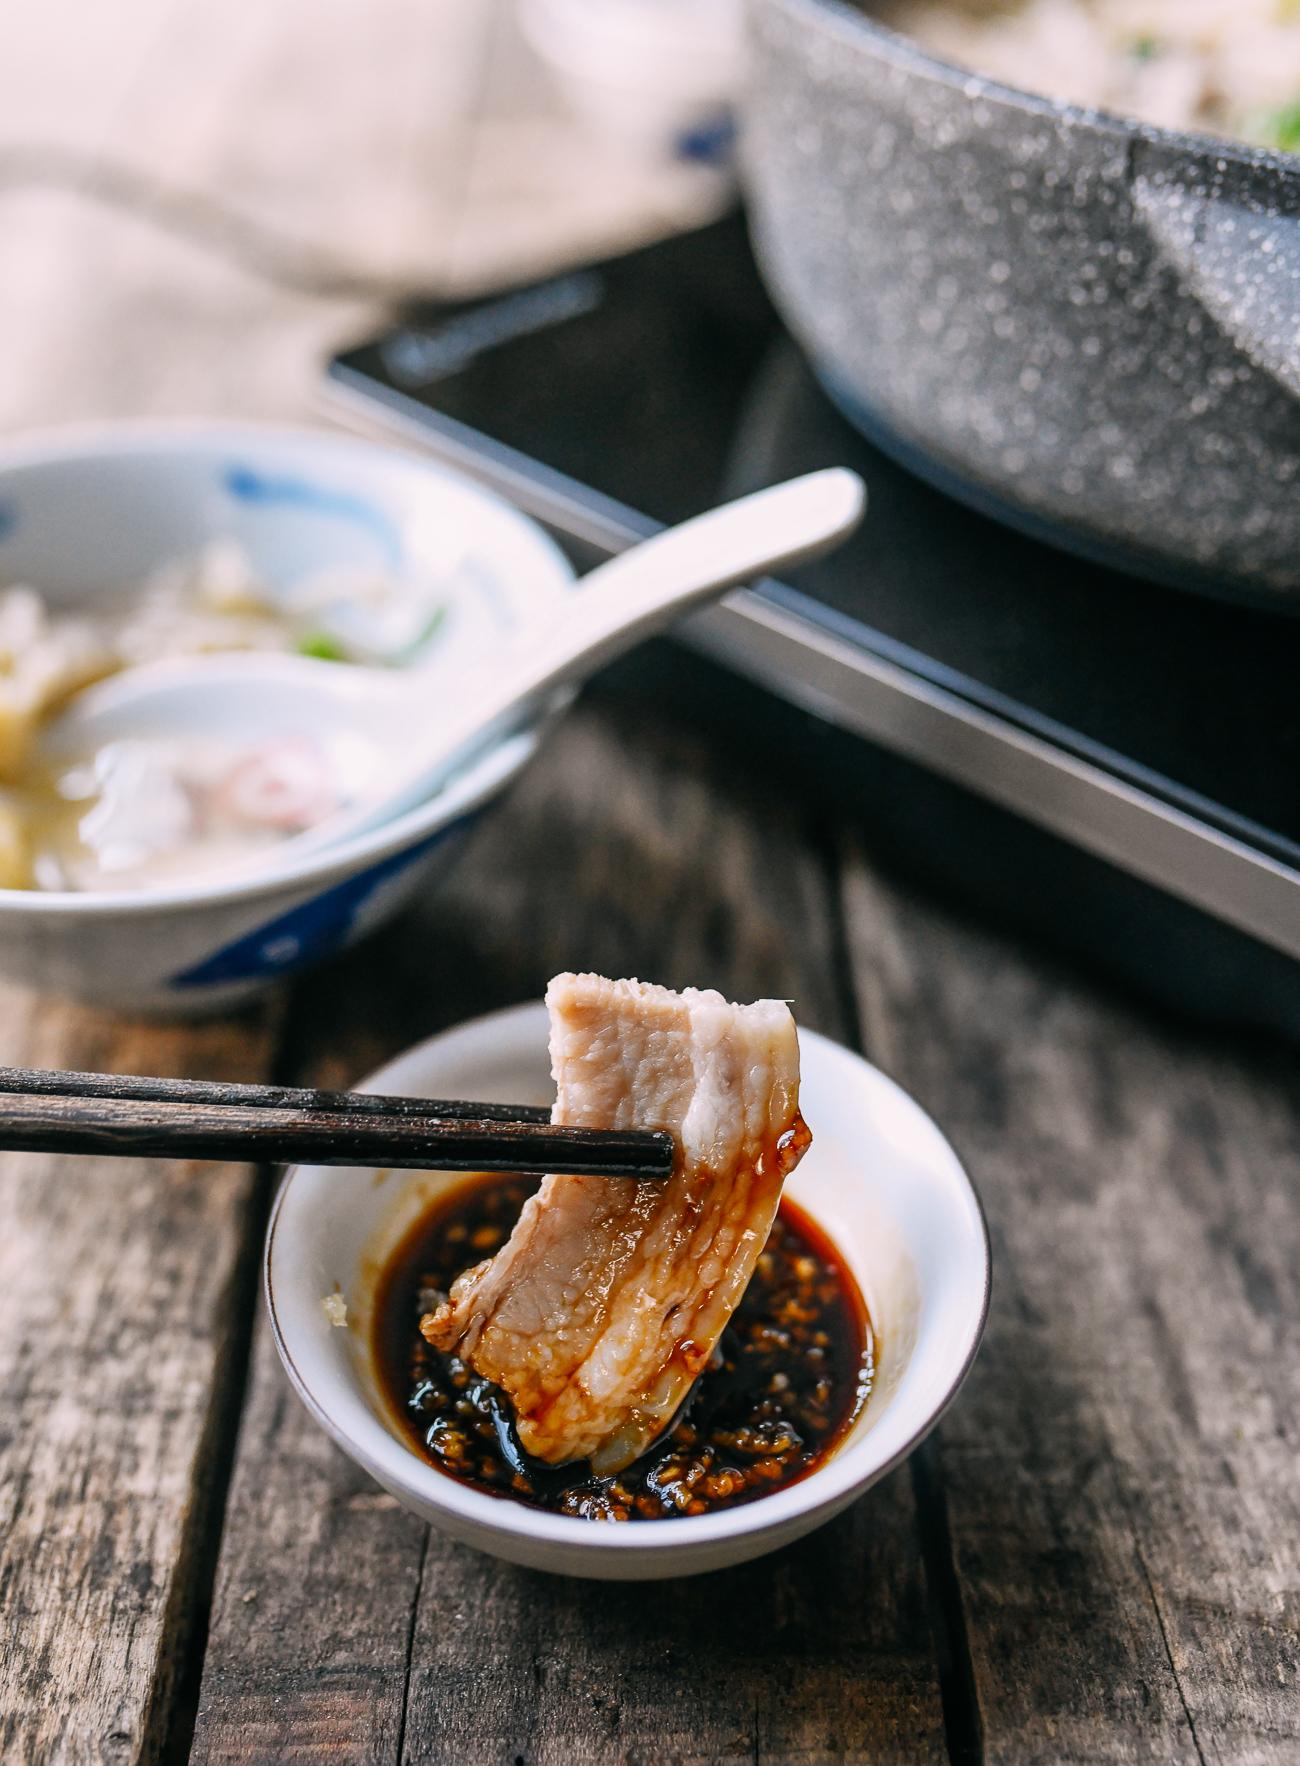 Dipping pork belly into garlic soy dipping sauce